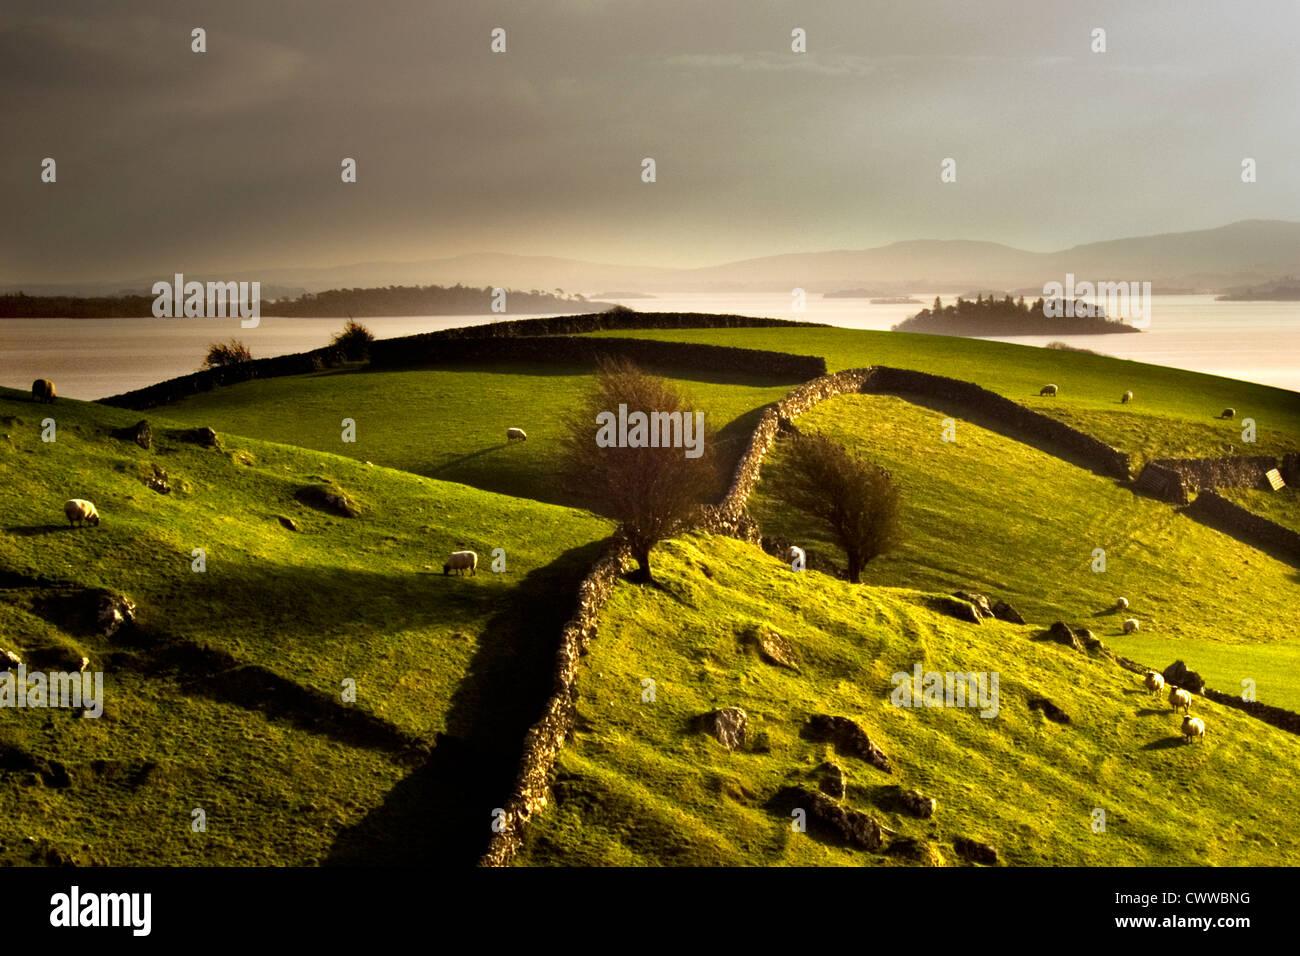 Stone walls on grassy rural hillside - Stock Image